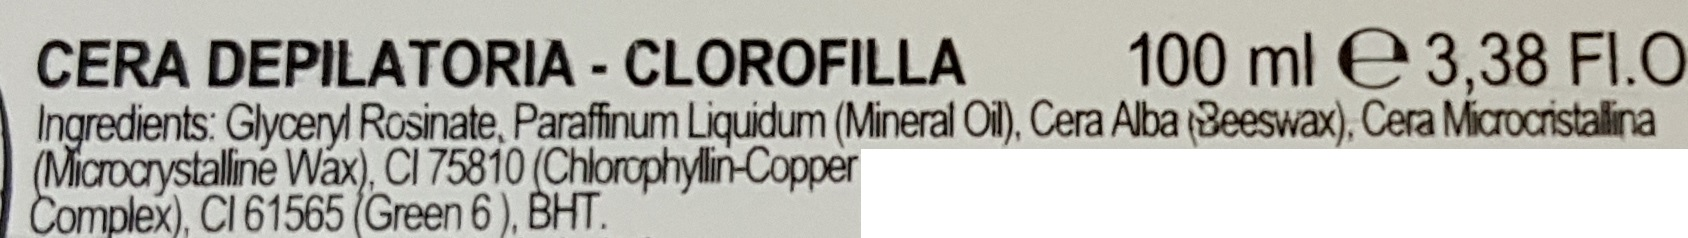 cera depilatoria clorofilla